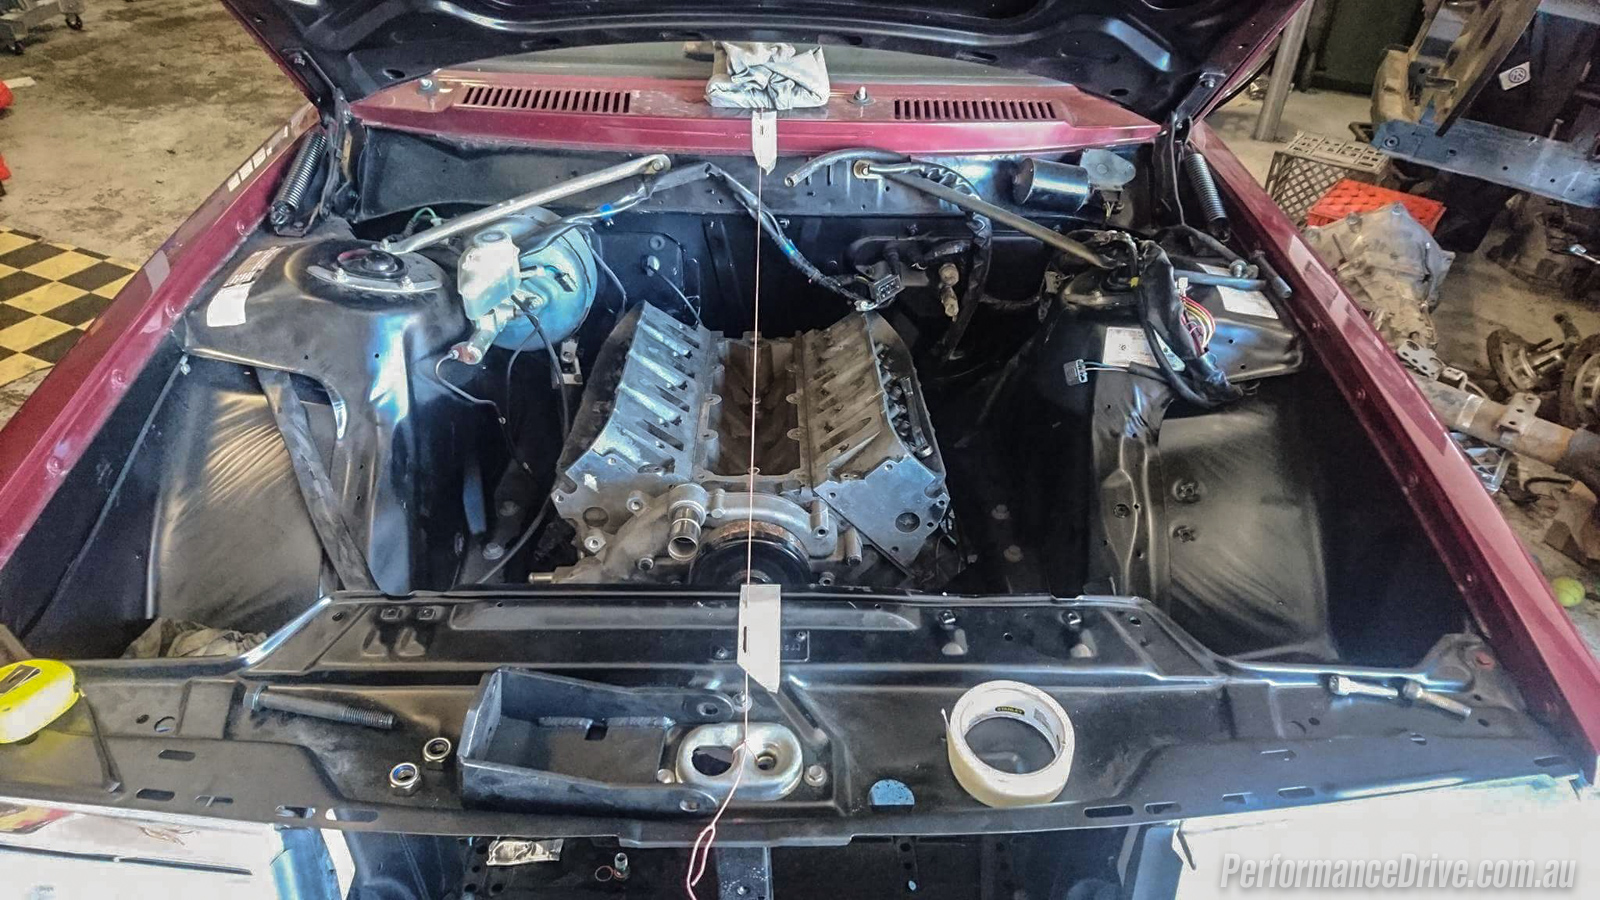 Volvo 240 GL LS1 V8 conversion project: Part 11 - engine